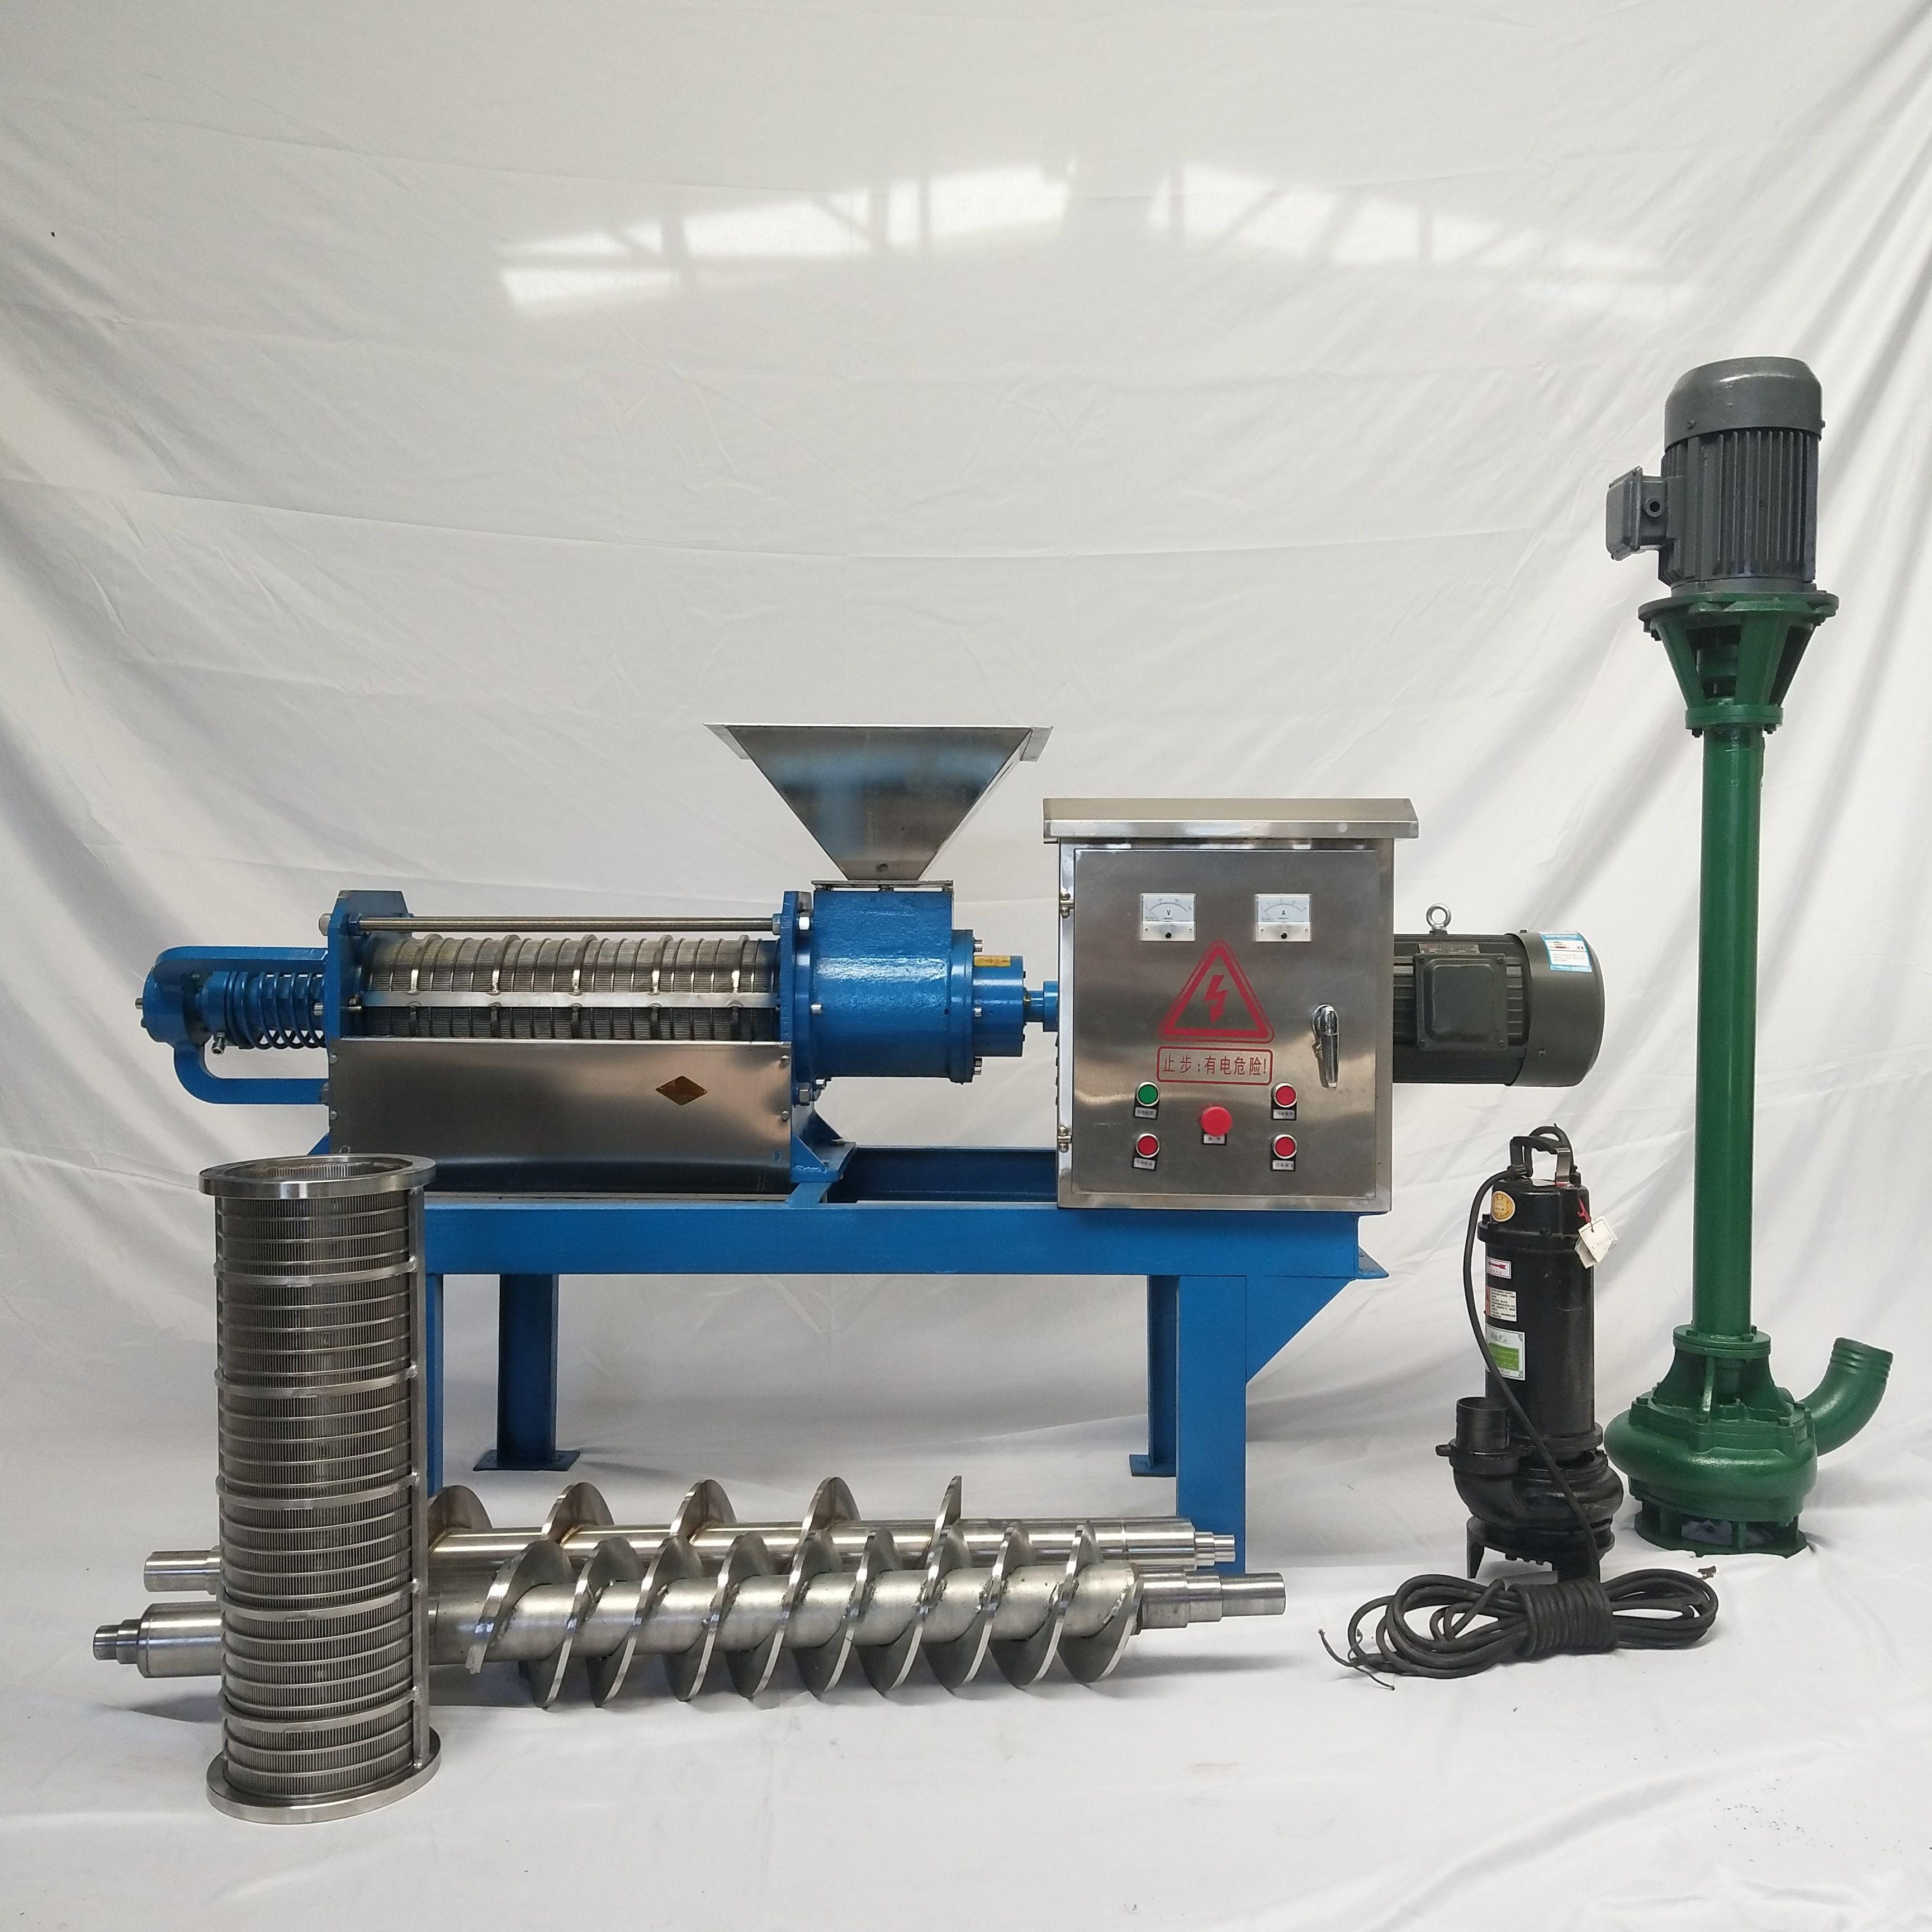 manure dewatering machine, dung separator, solid liquid